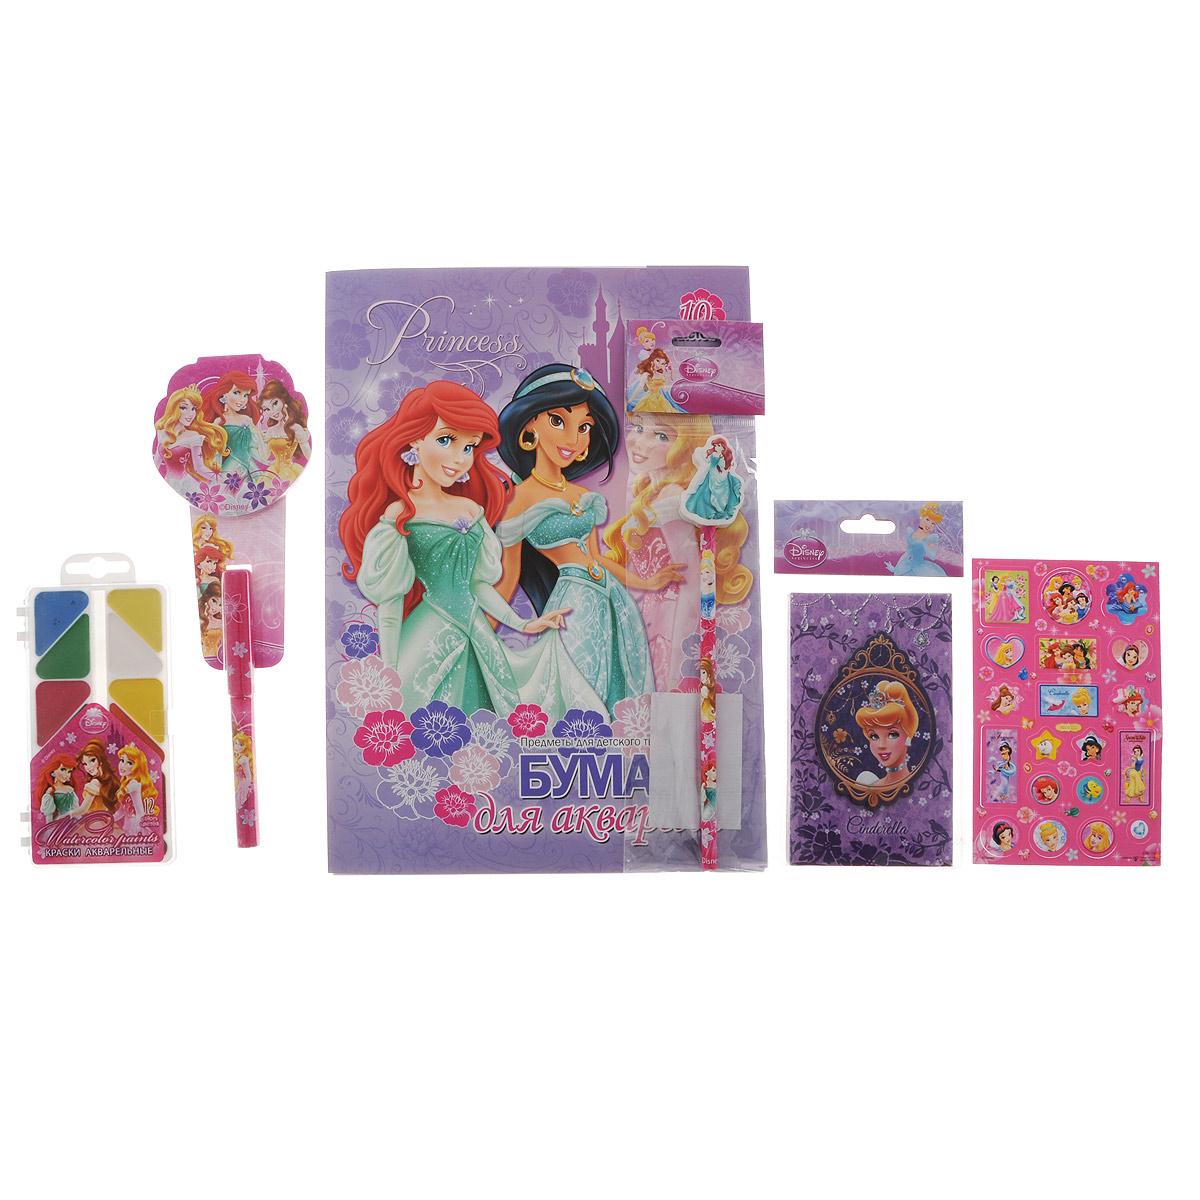 Подарочный канцелярский набор  Disney Princess . PRСZ-US1-AZ15-BOX2 -  Канцелярские наборы